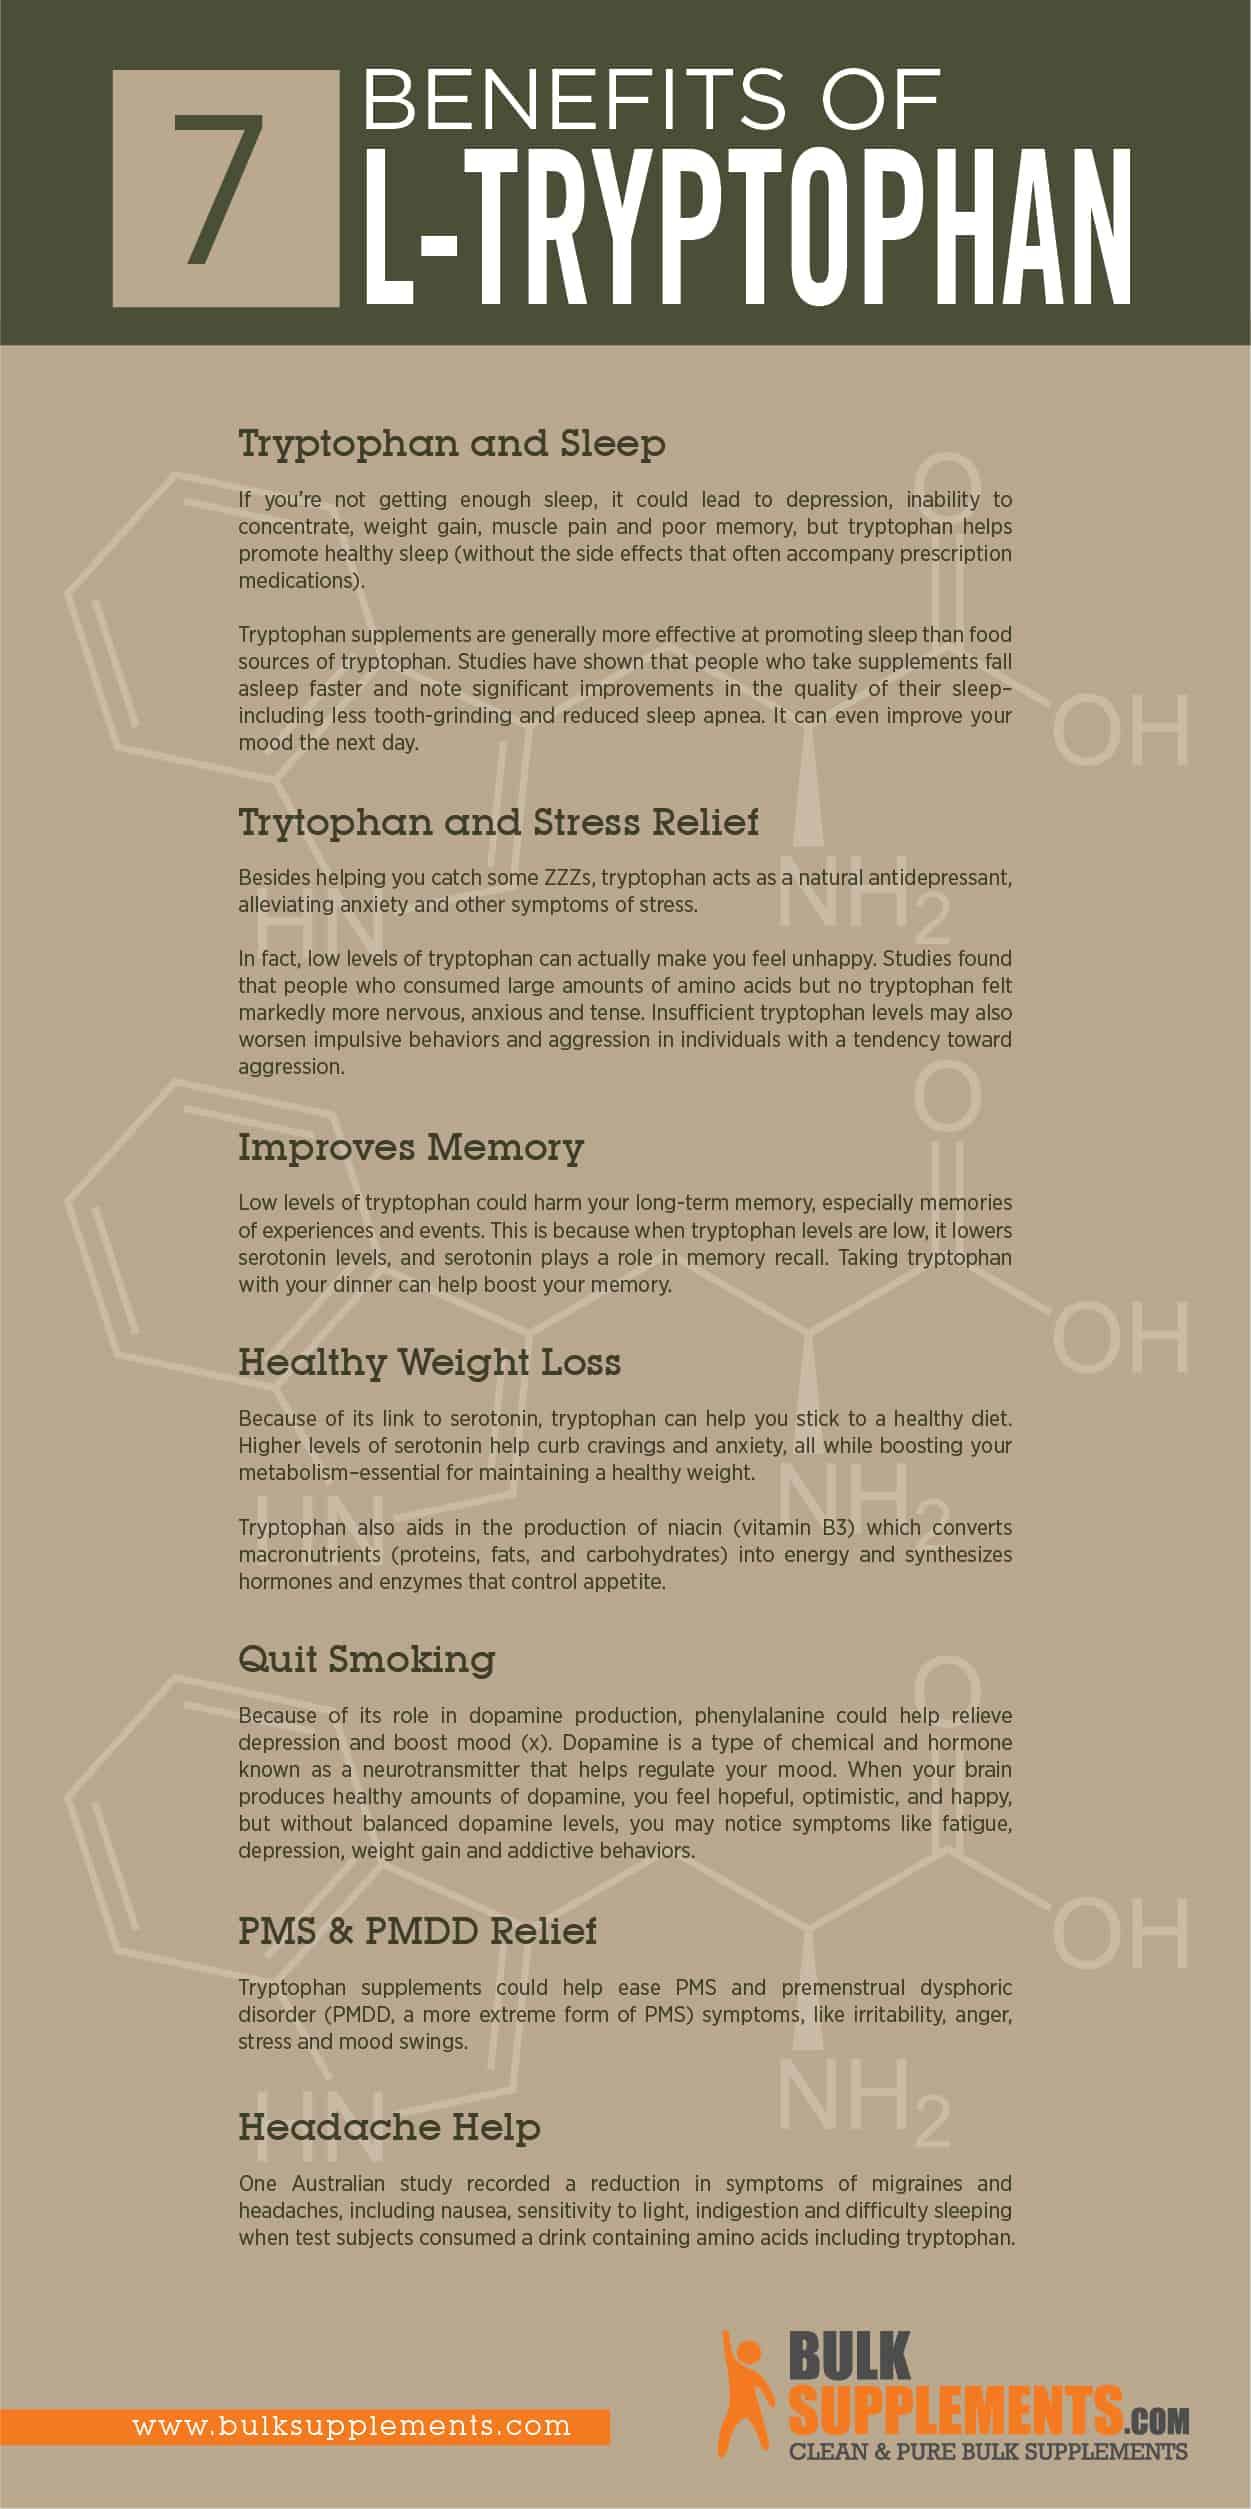 l-tryptophan benefits